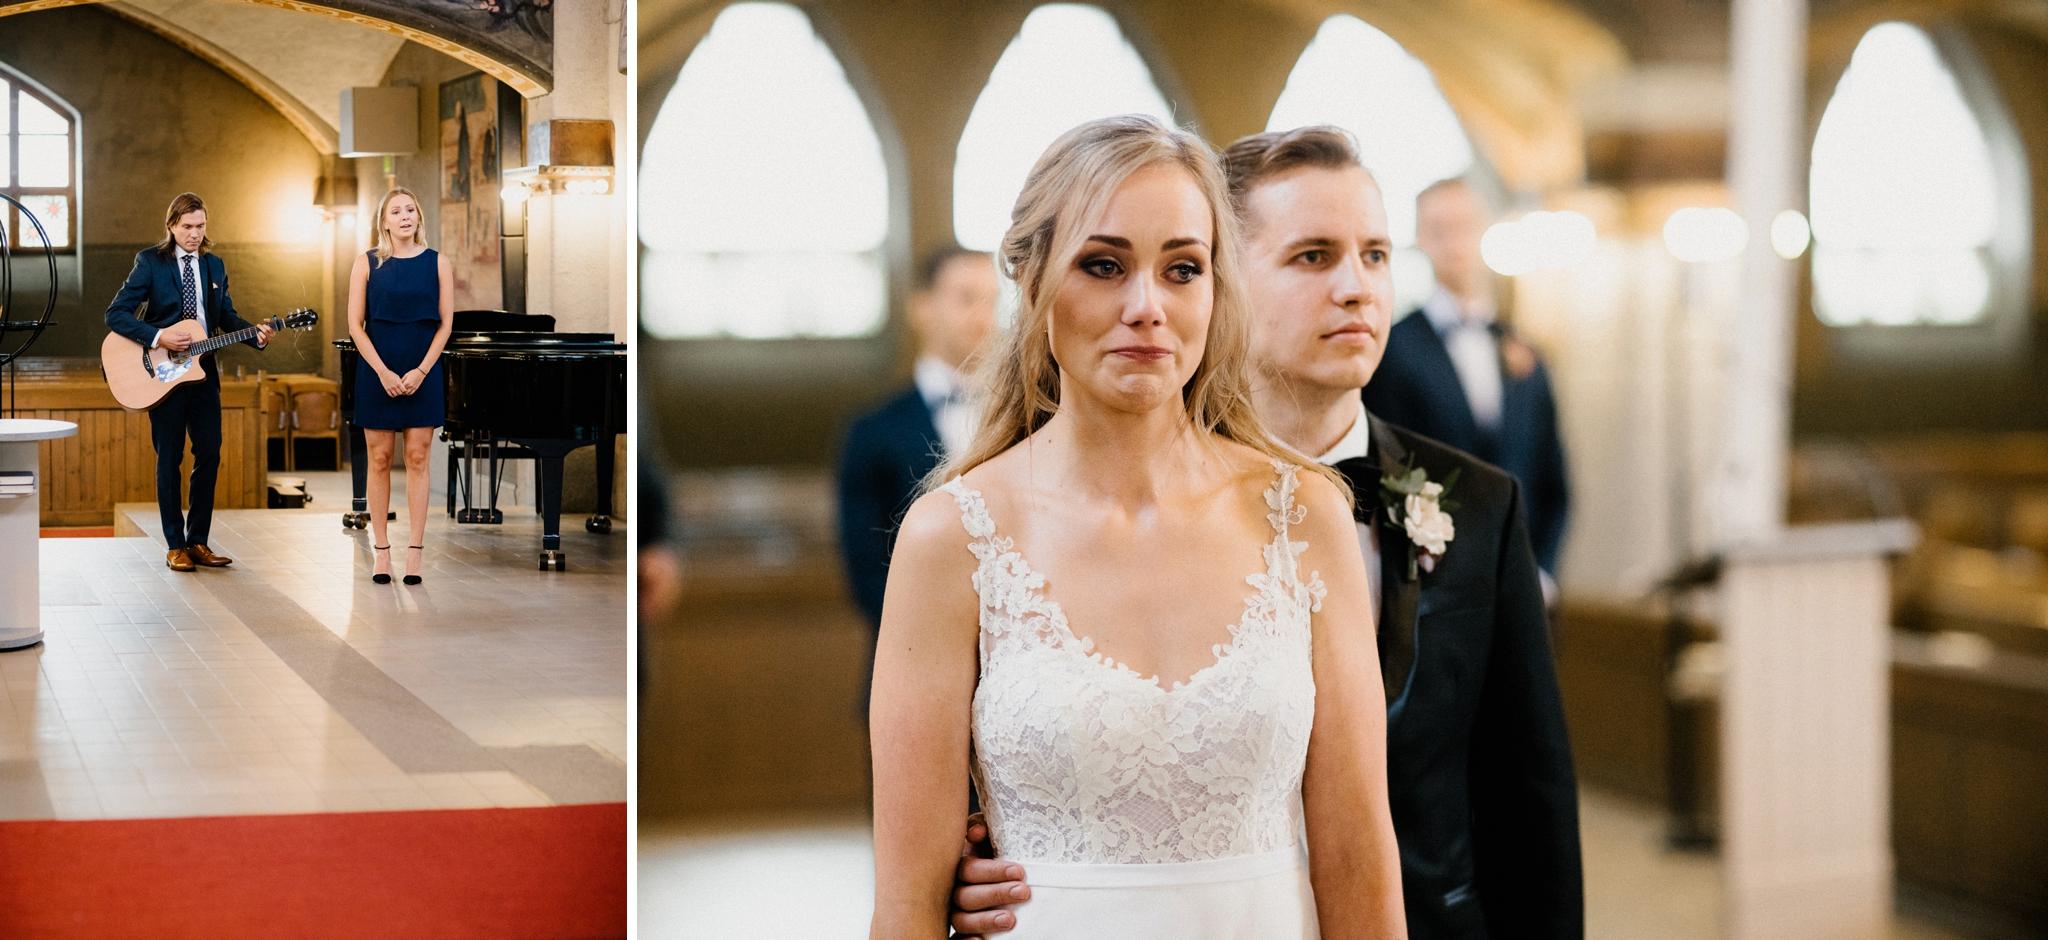 Johanna + Mikko - Tampere - Photo by Patrick Karkkolainen Wedding Photographer-73.jpg